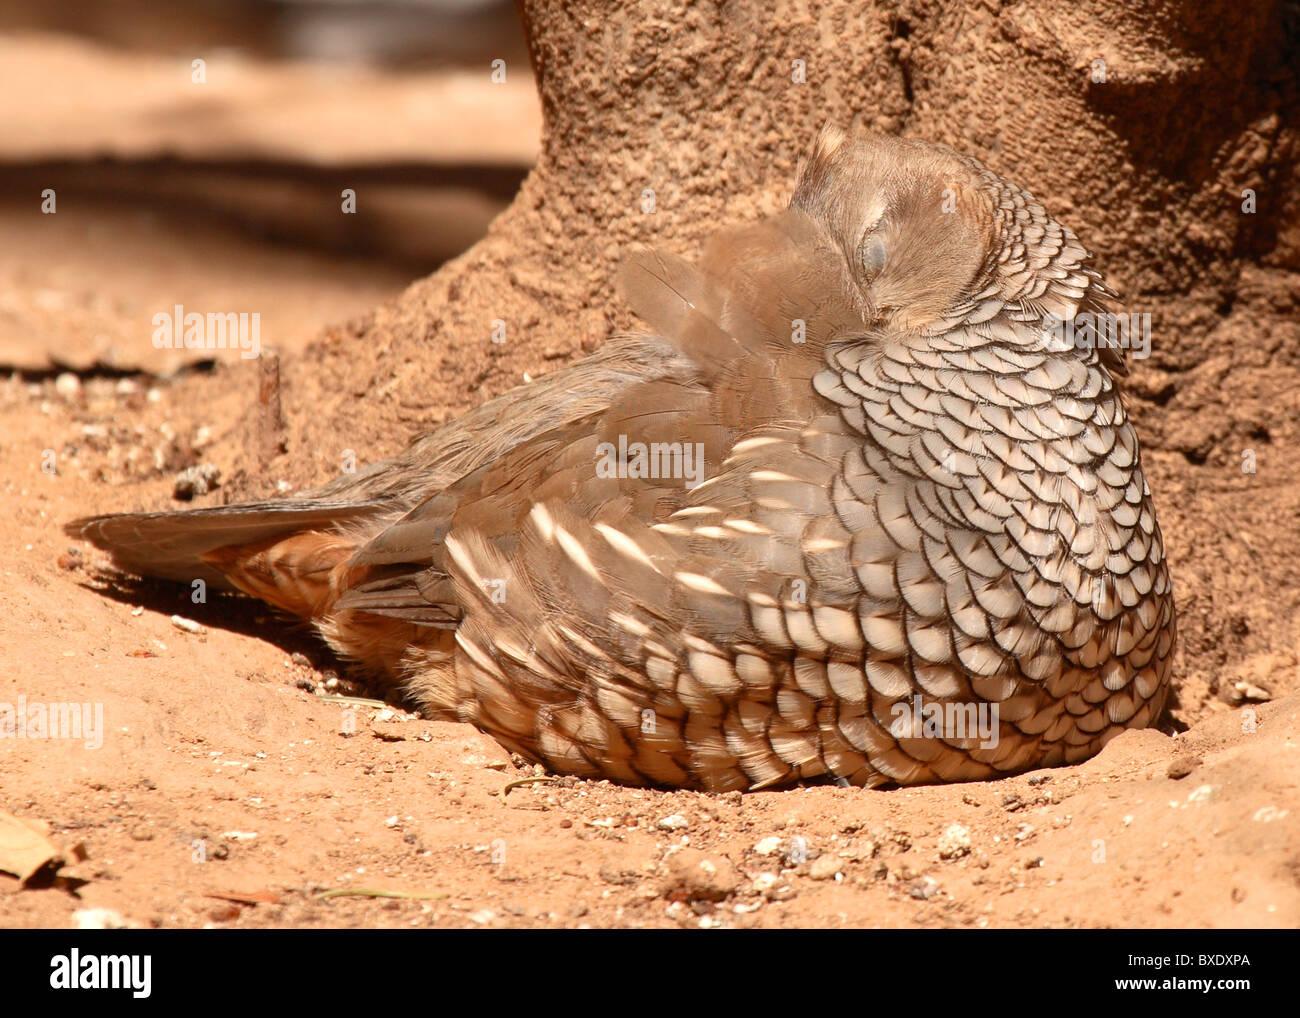 Cute Quail Stock Photos & Cute Quail Stock Images - Alamy